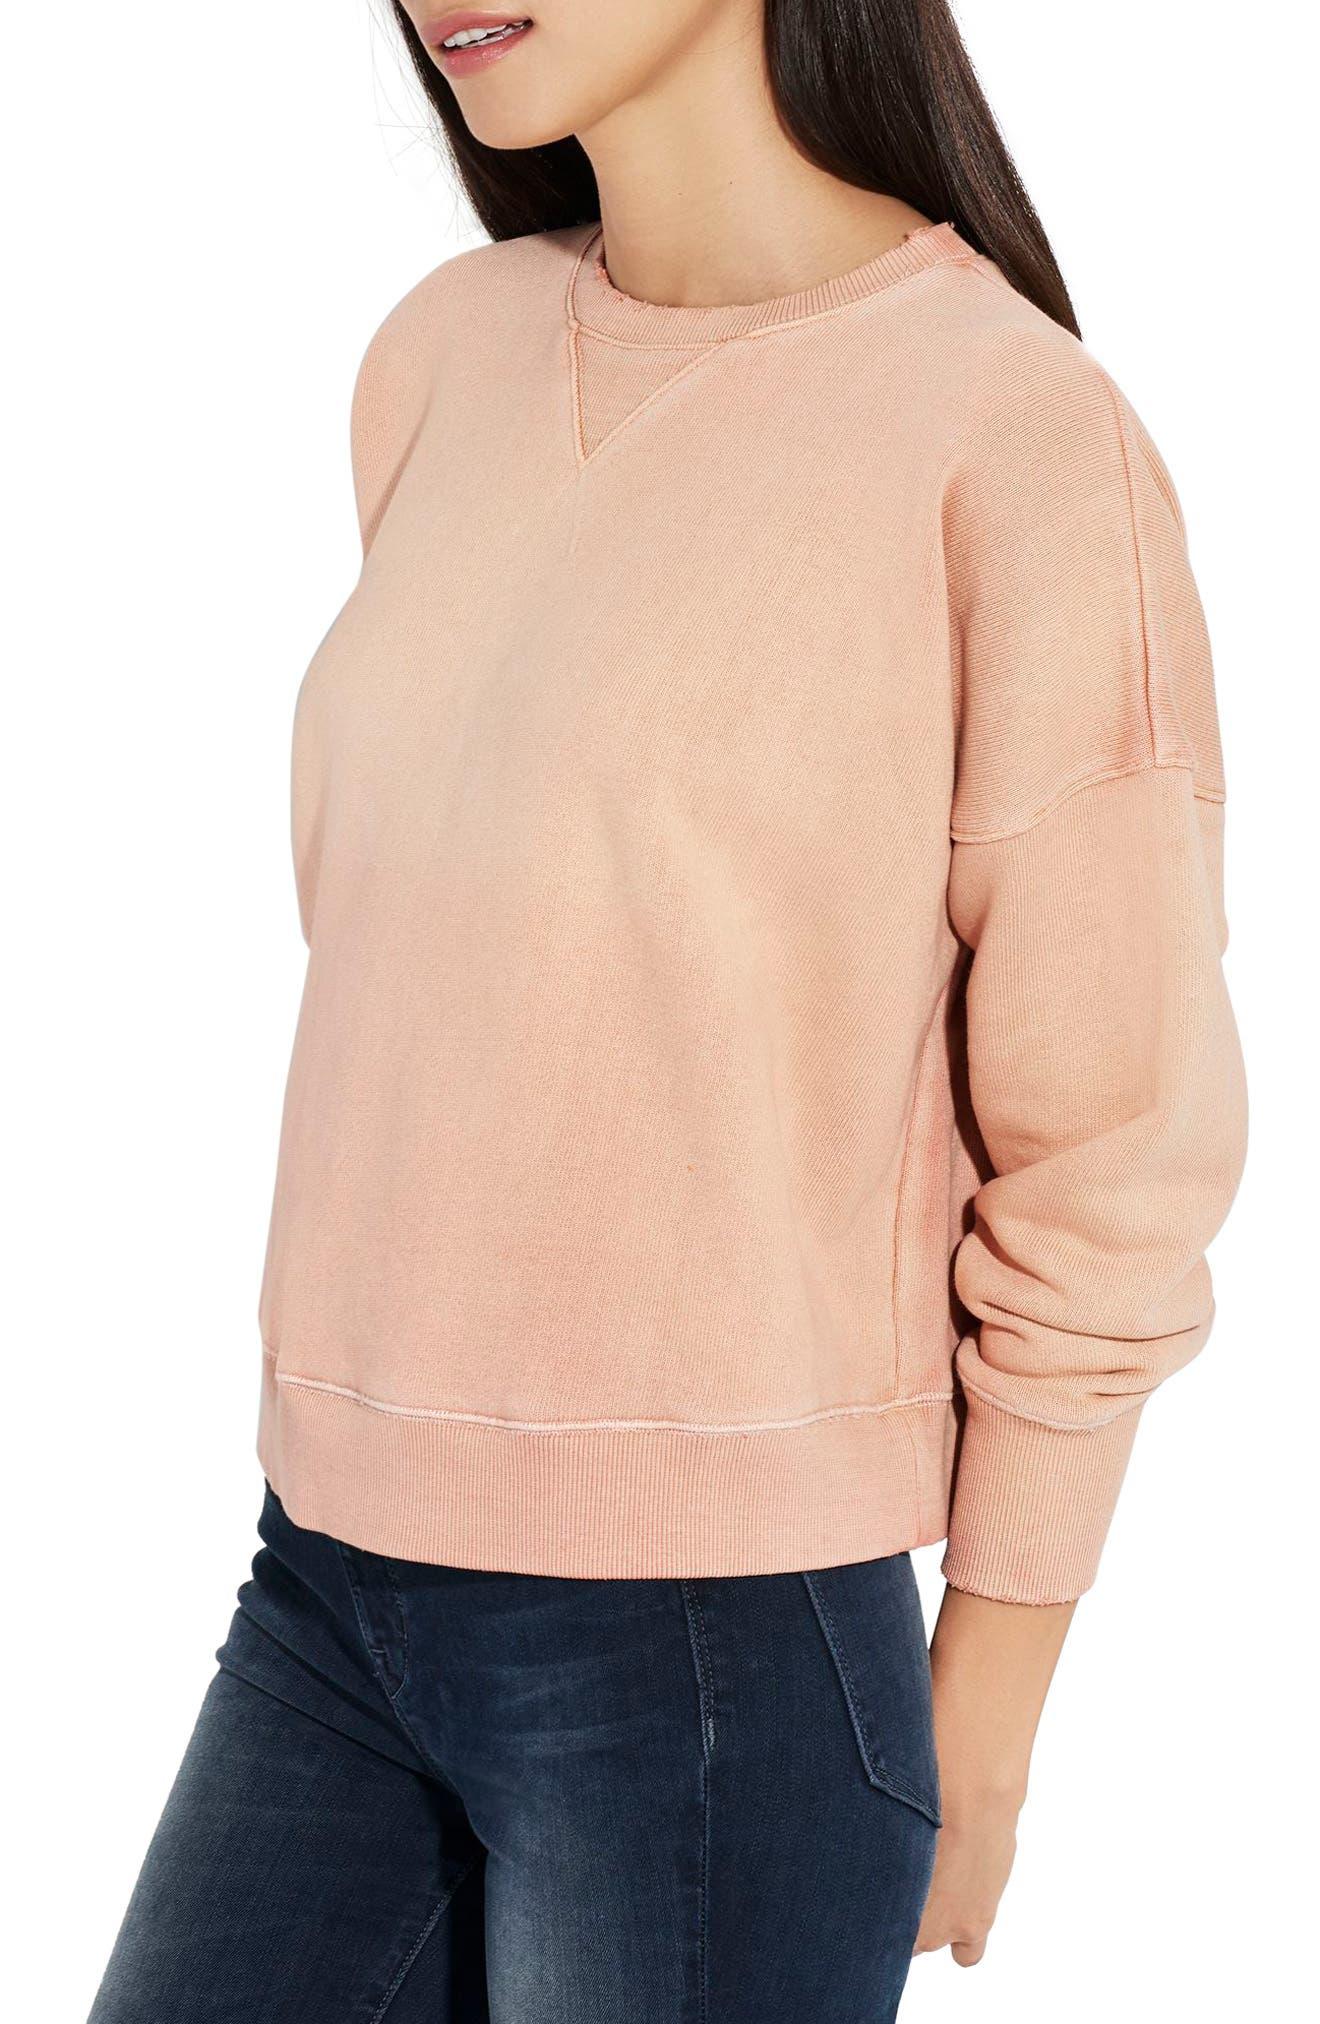 The Big Guy Sweatshirt,                             Alternate thumbnail 3, color,                             800